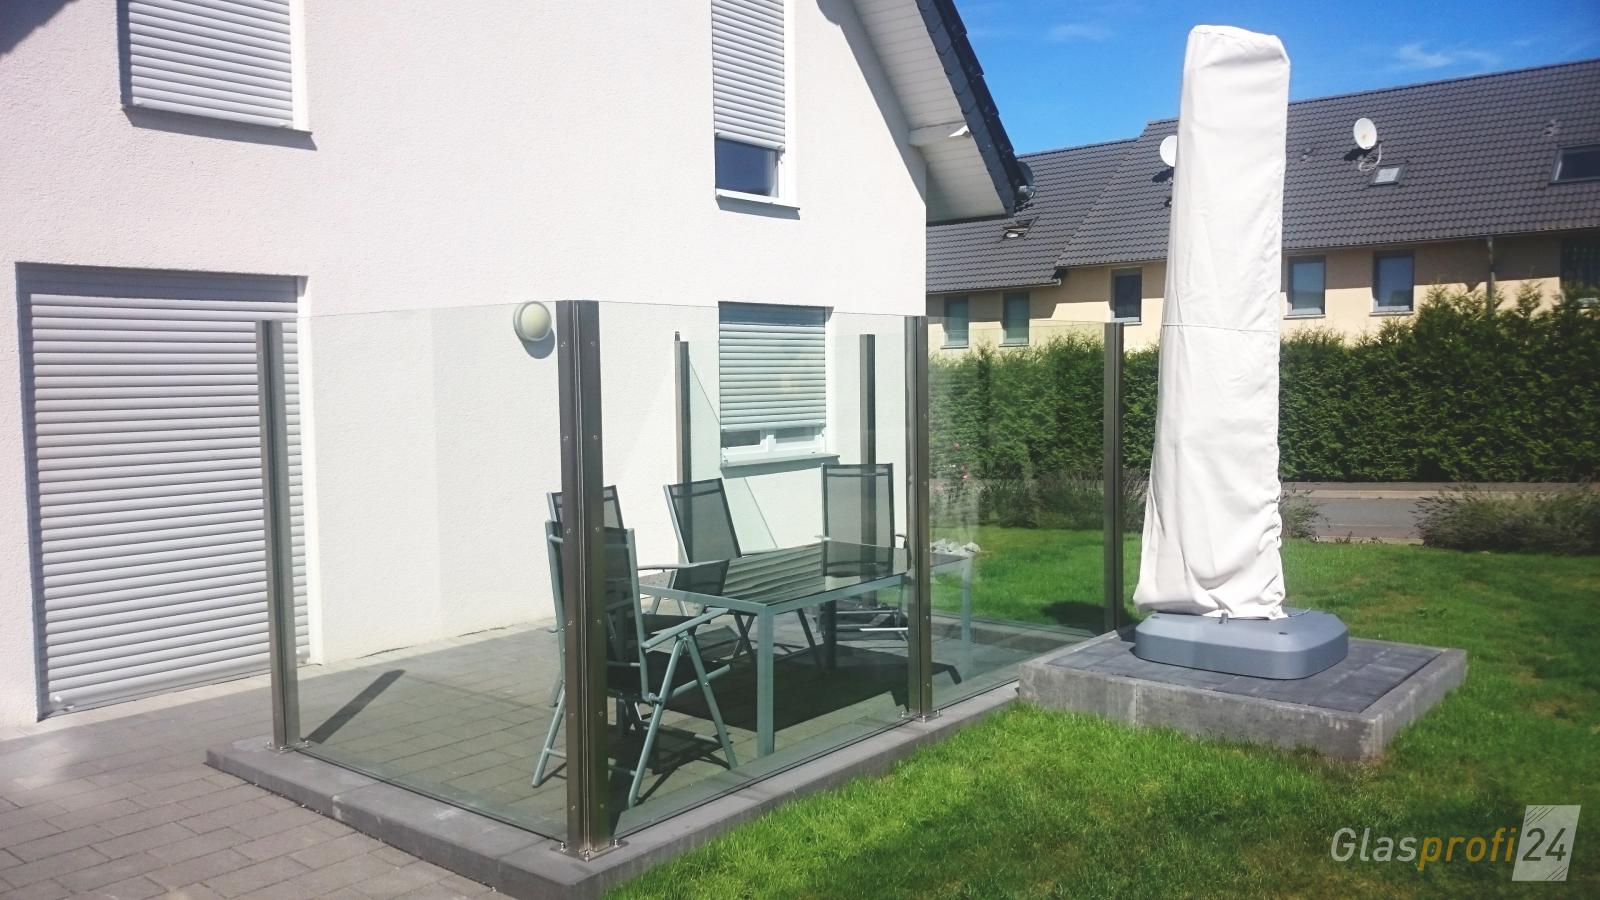 windschutz f r die terrasse glasprofi24. Black Bedroom Furniture Sets. Home Design Ideas